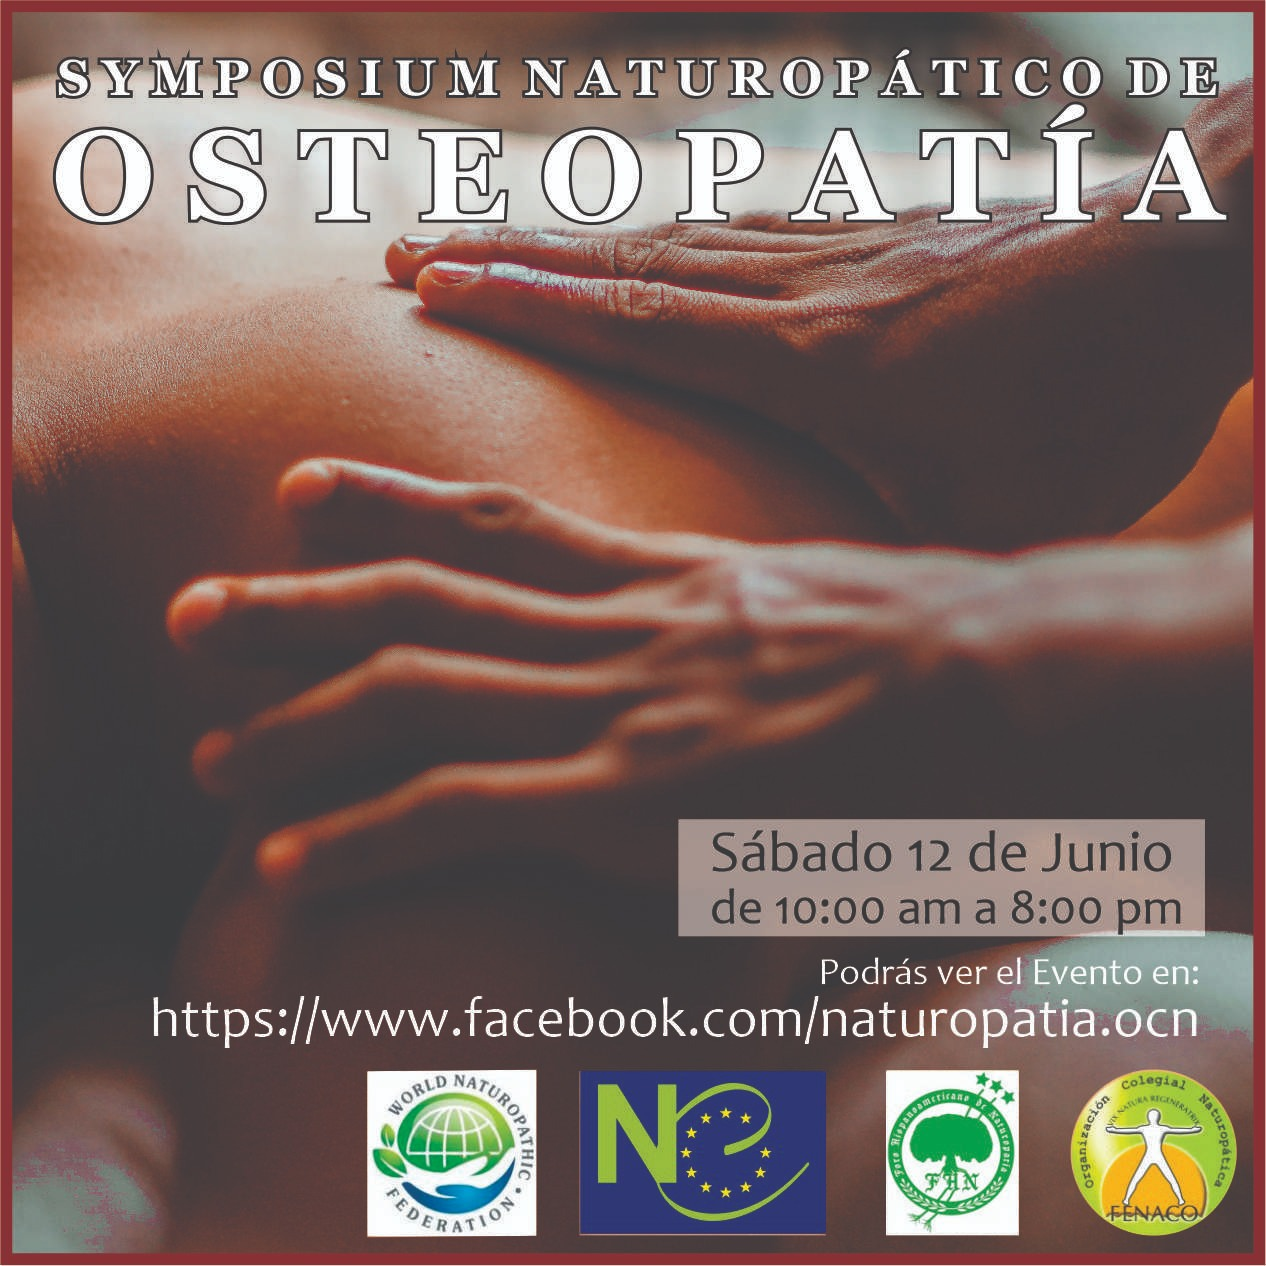 SYMPOSIUM NATUROPÁTICO DE OSTEOPATIA @ ONLINE FACEBOOK